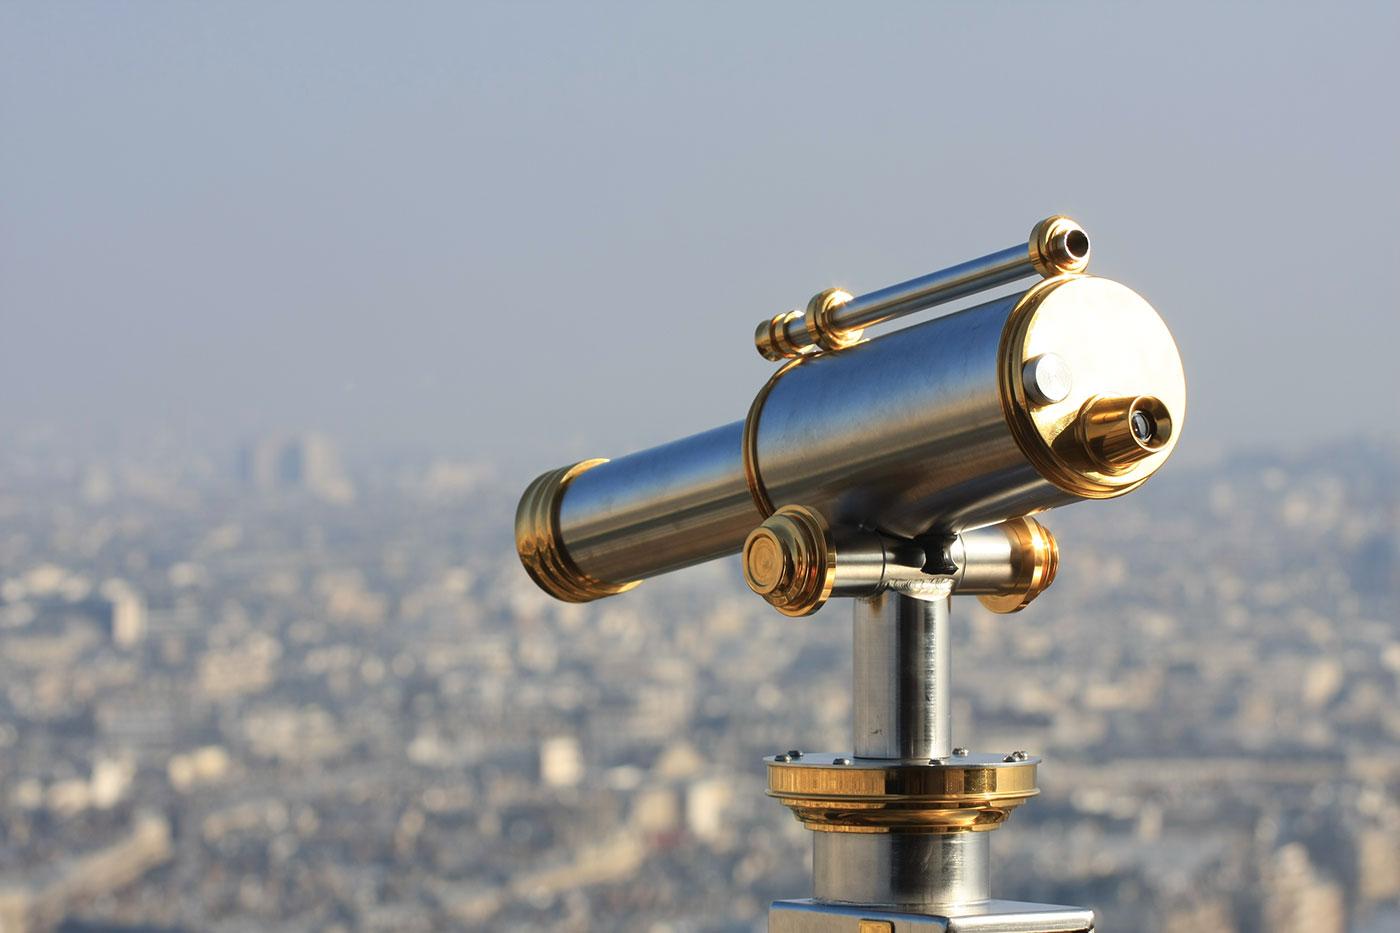 Telescope on Eiffel Tower